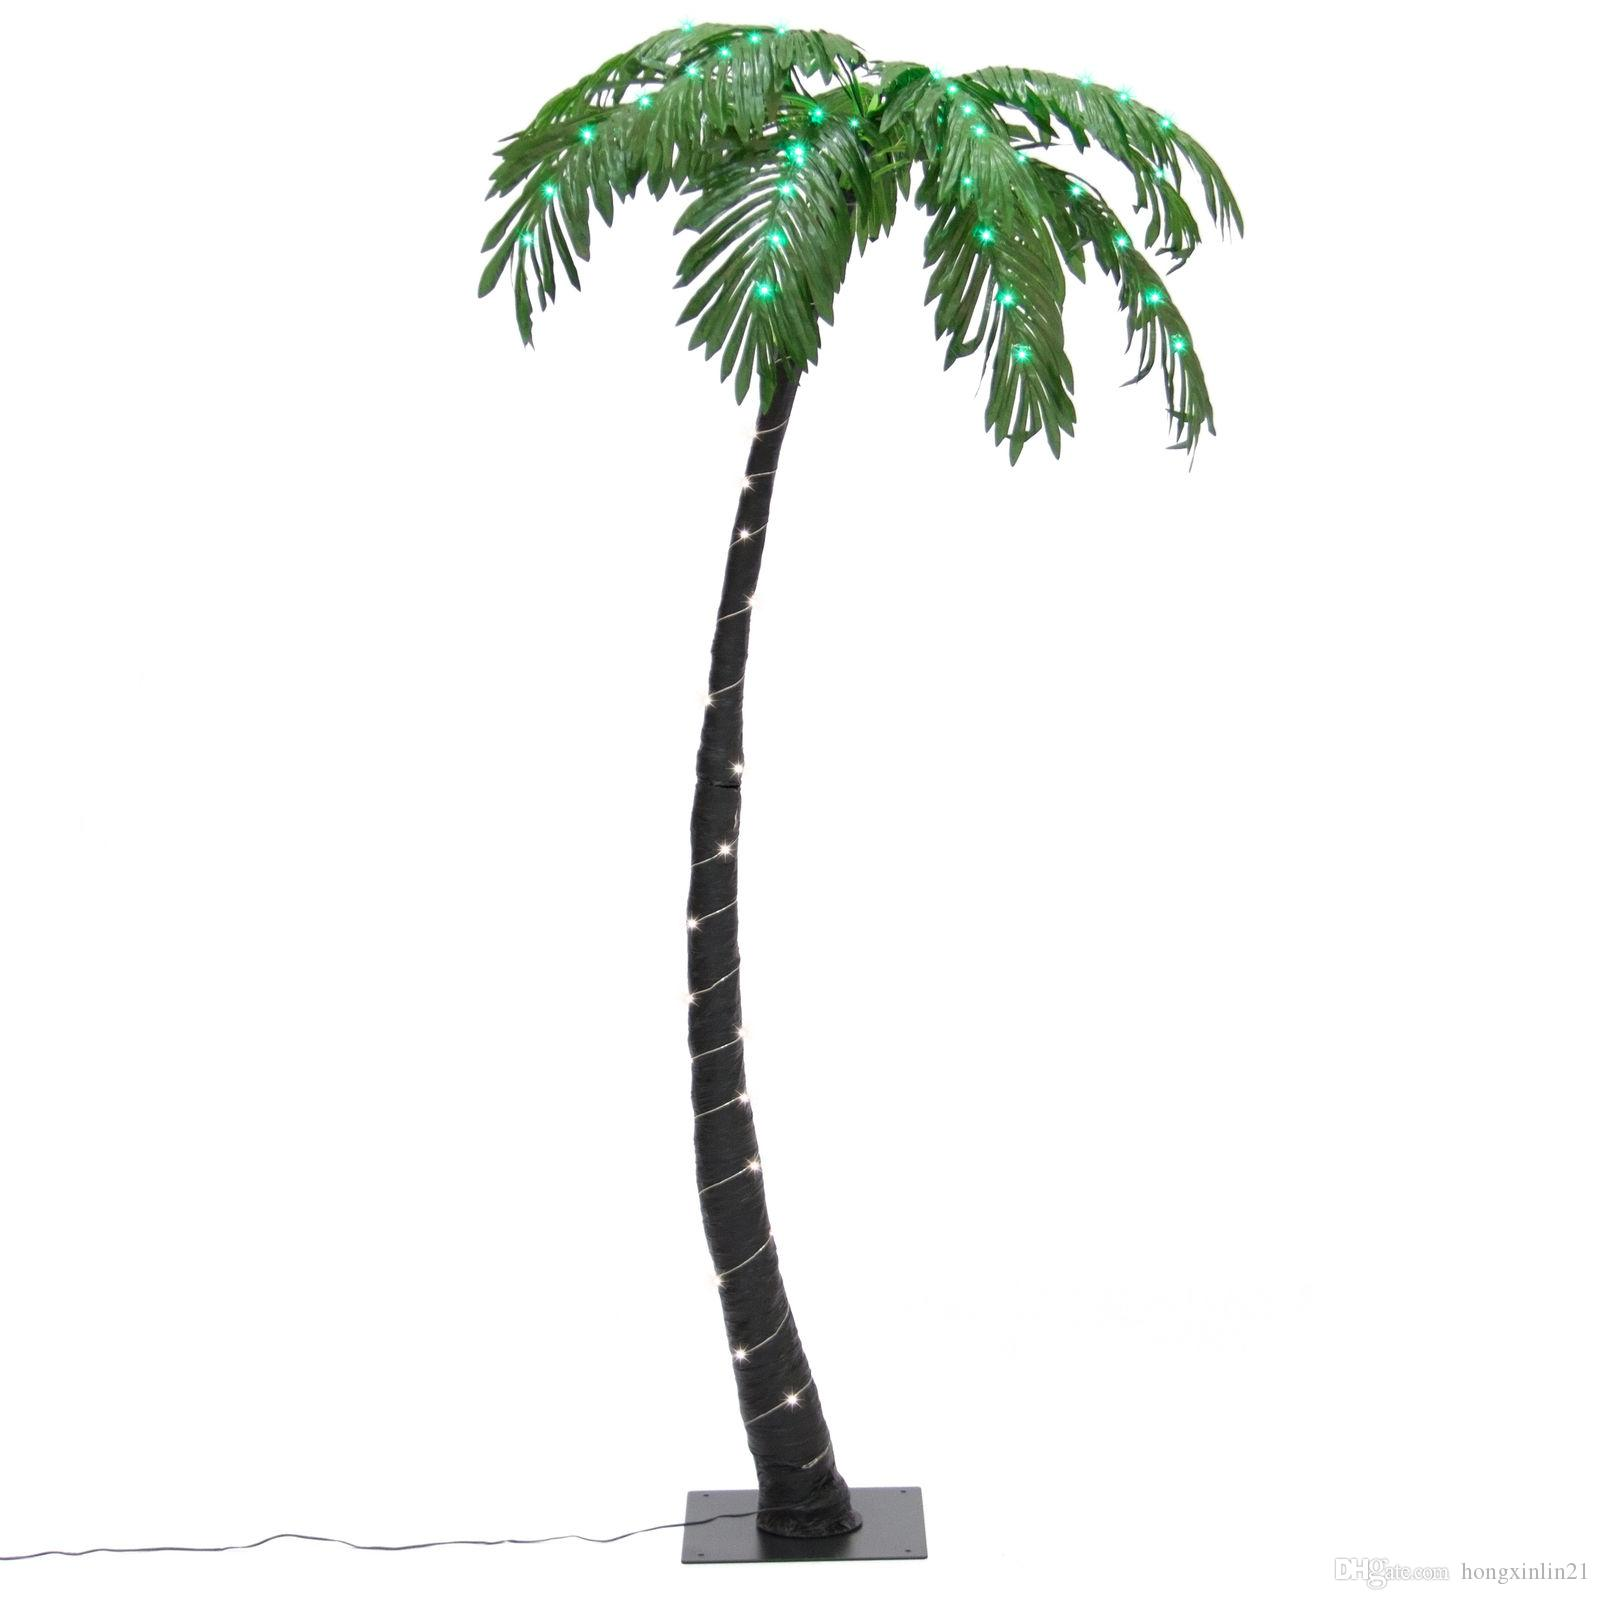 image royalty decor free vector hd shutterstock stock decorative tree